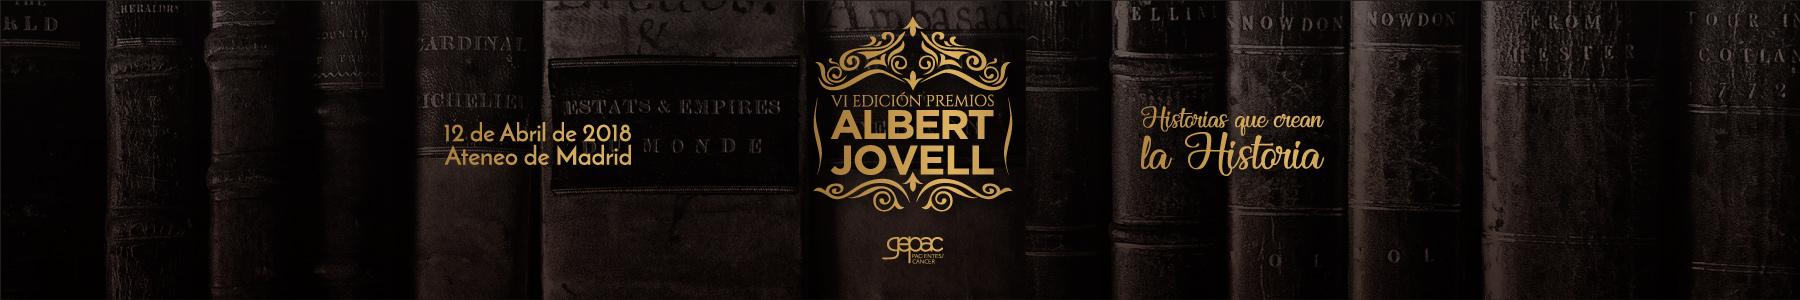 banner-aeal-premios-albert-jovell-2018